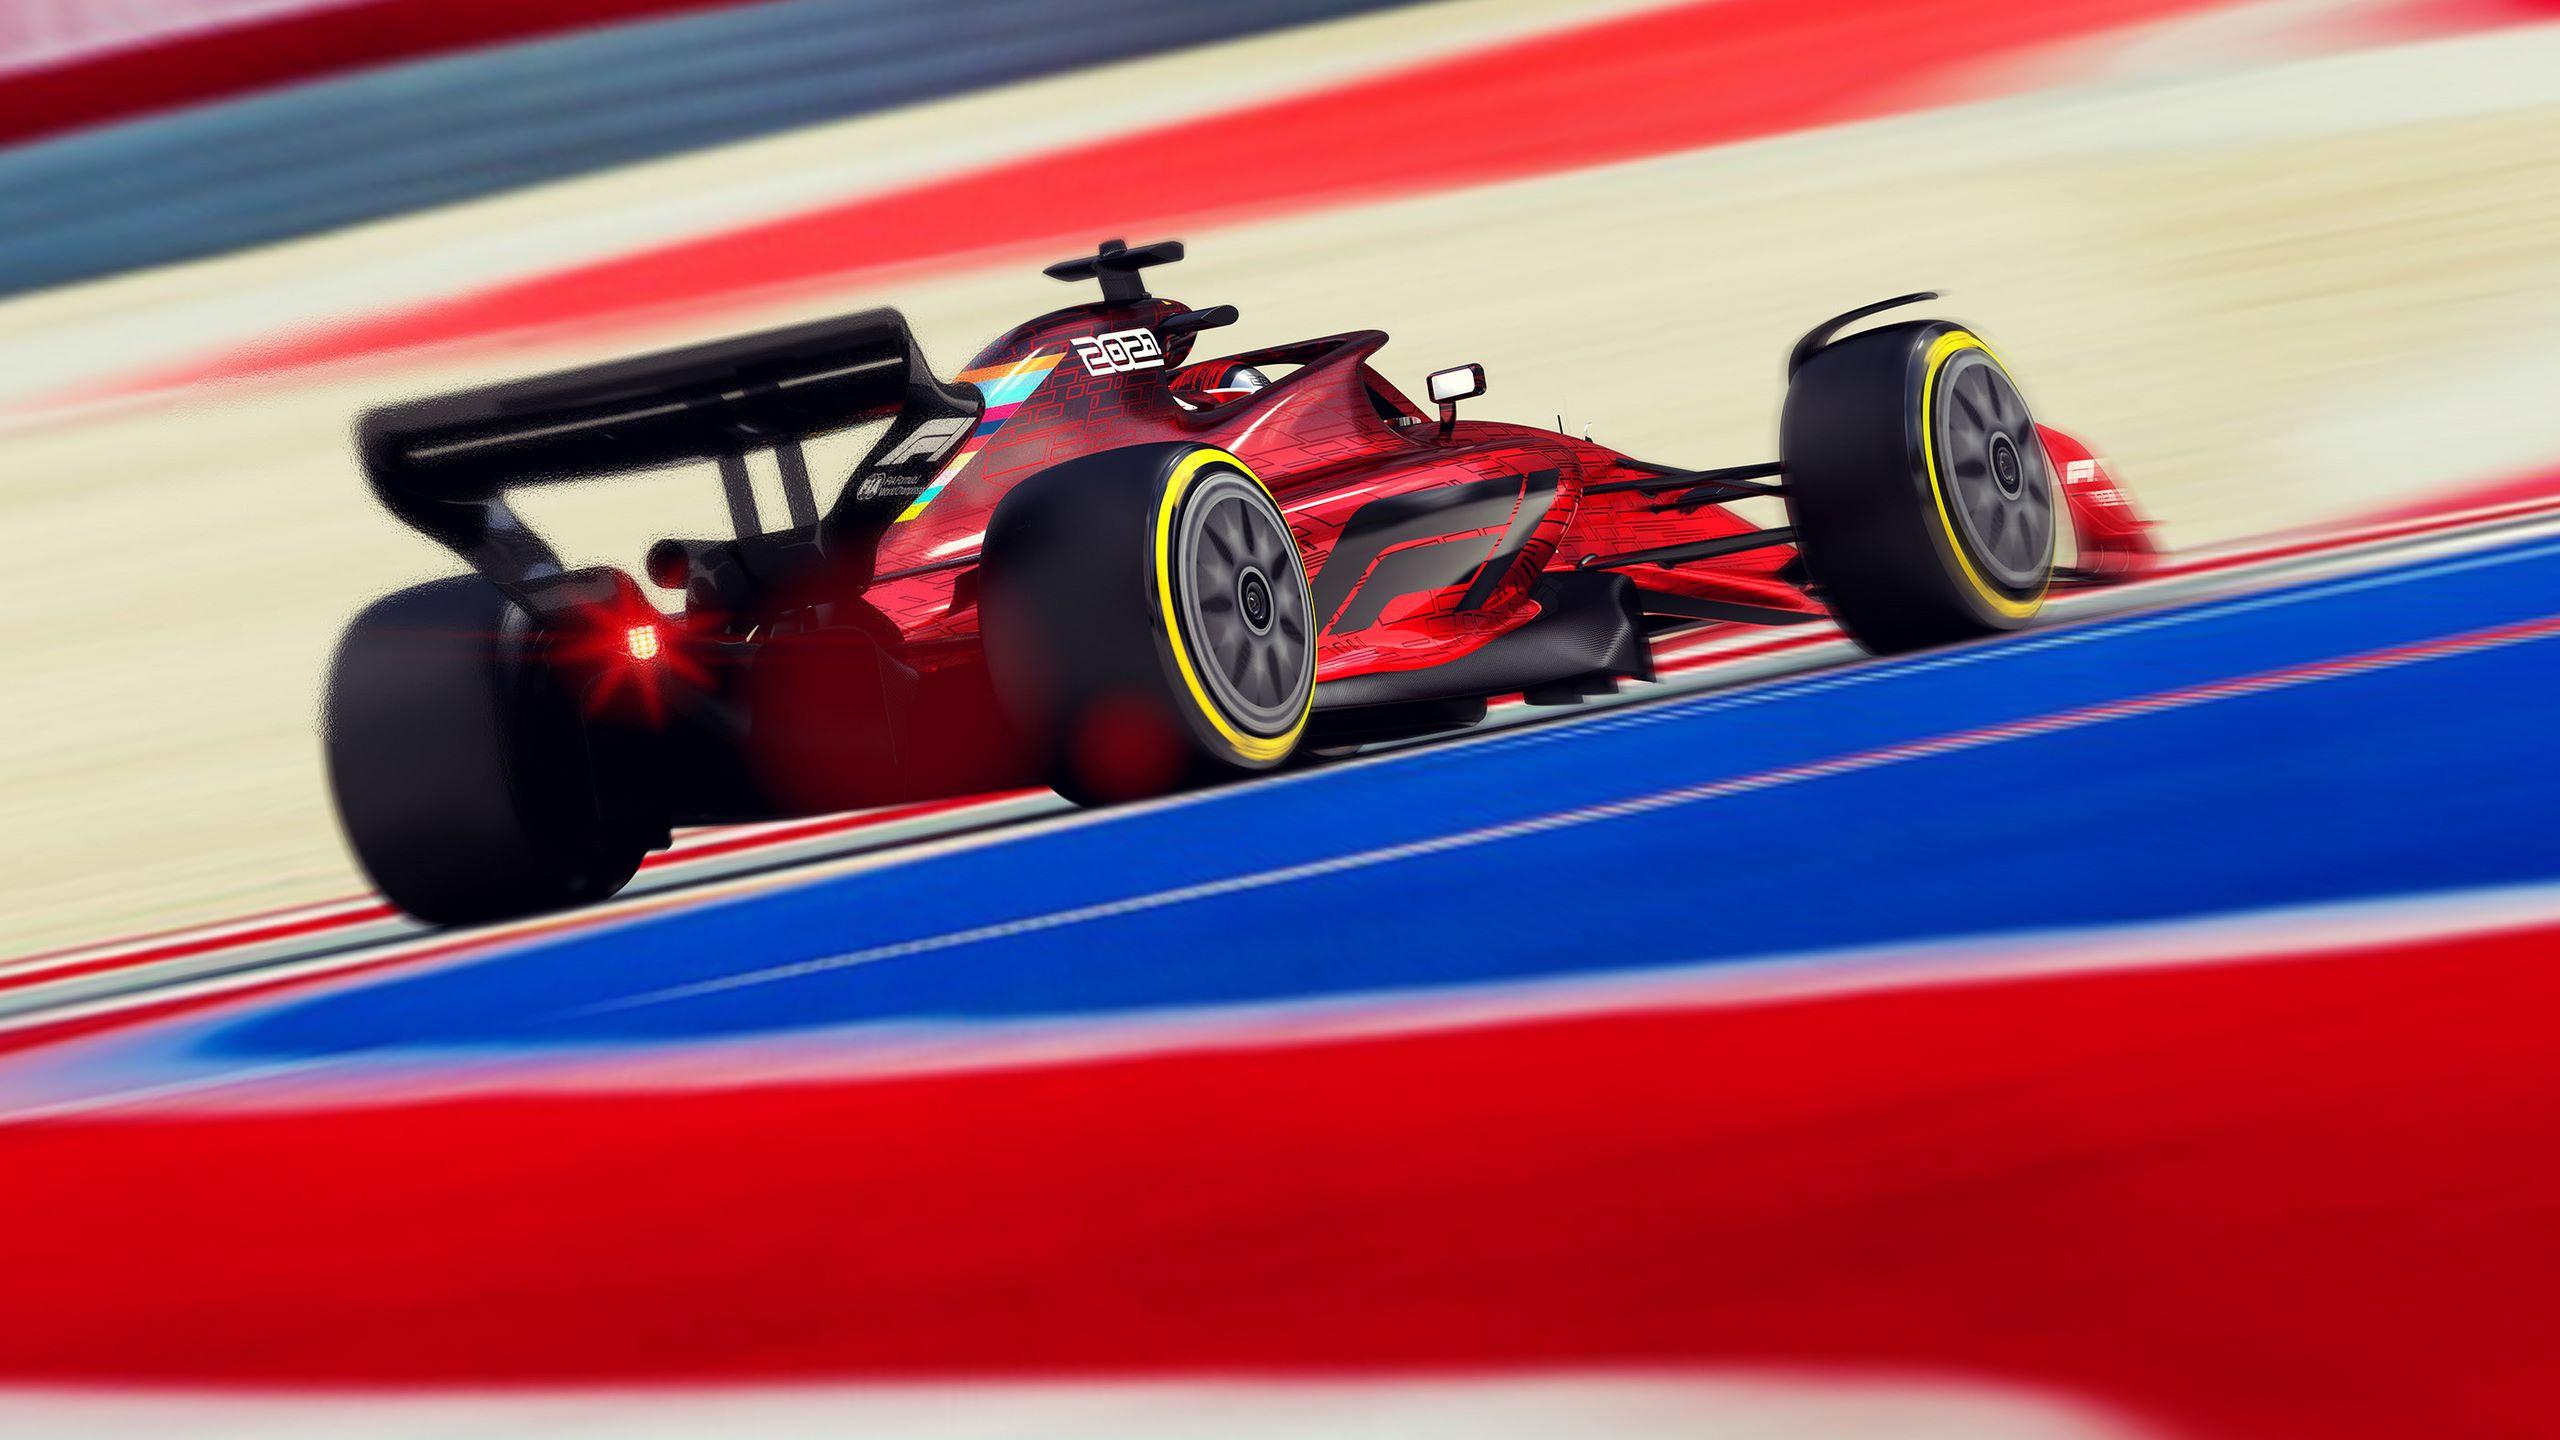 2021-formula-1-race-car-rendering f1 (14)